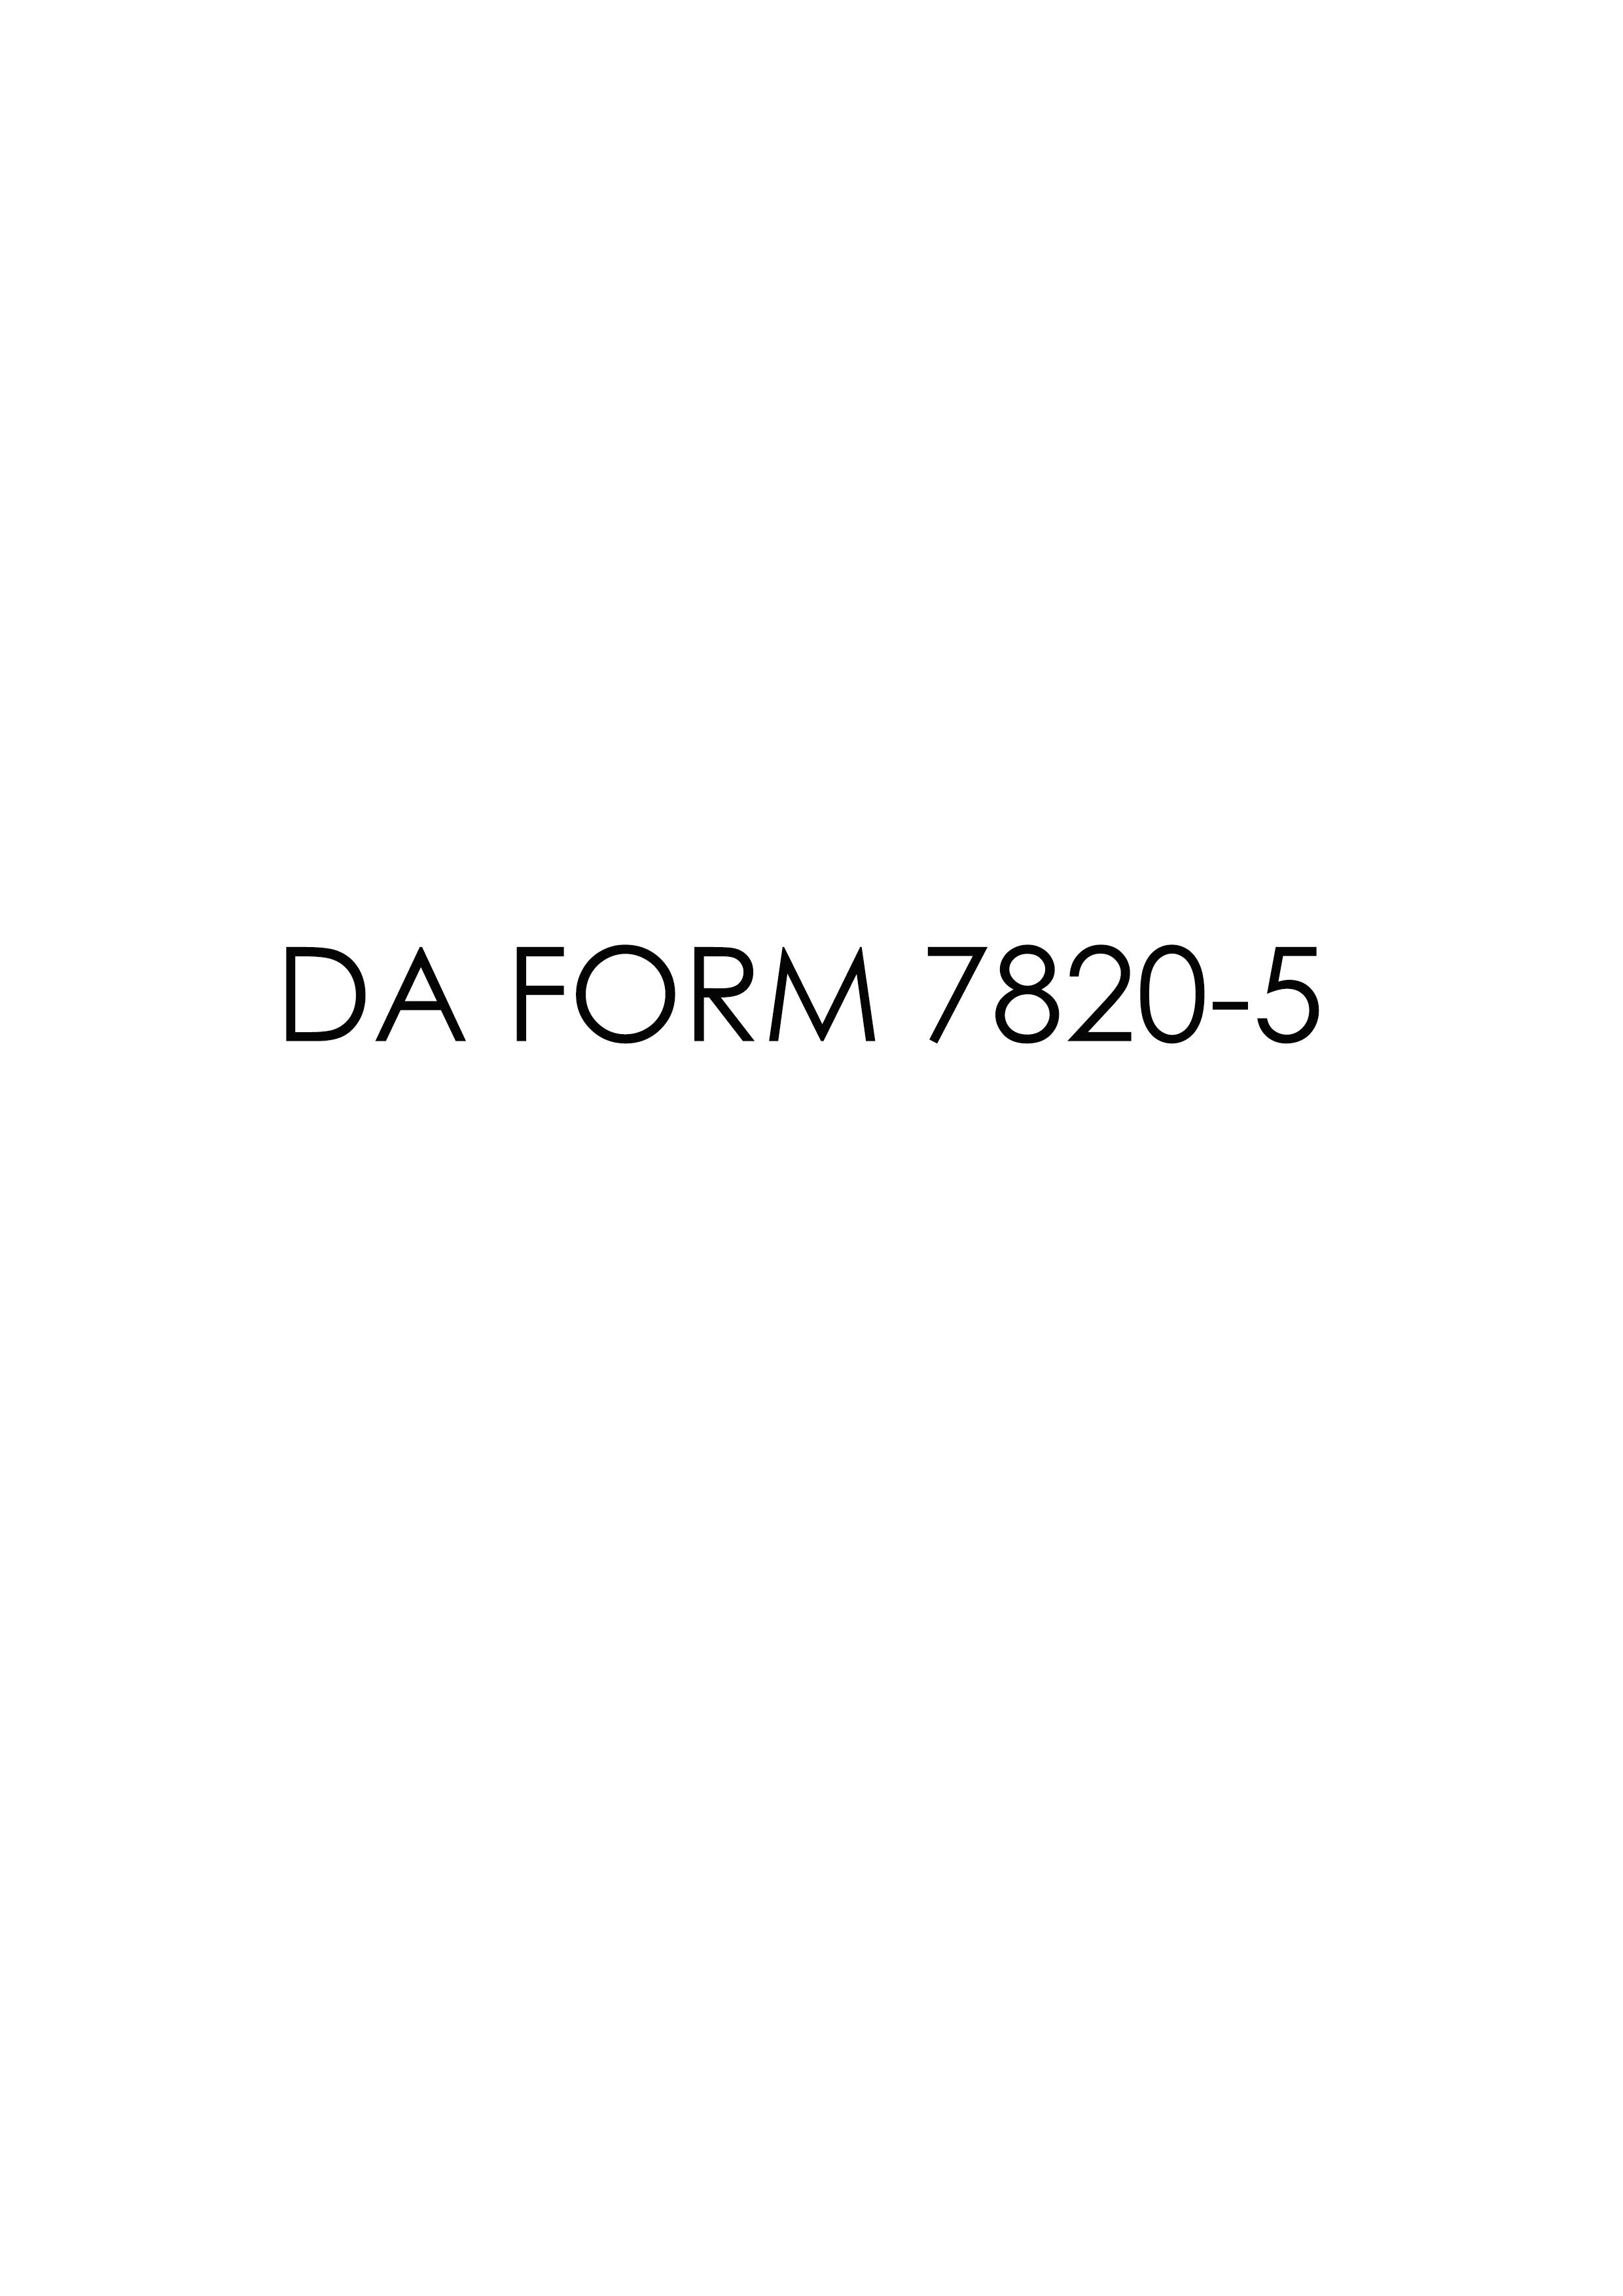 Download da Form 7820-5 Free